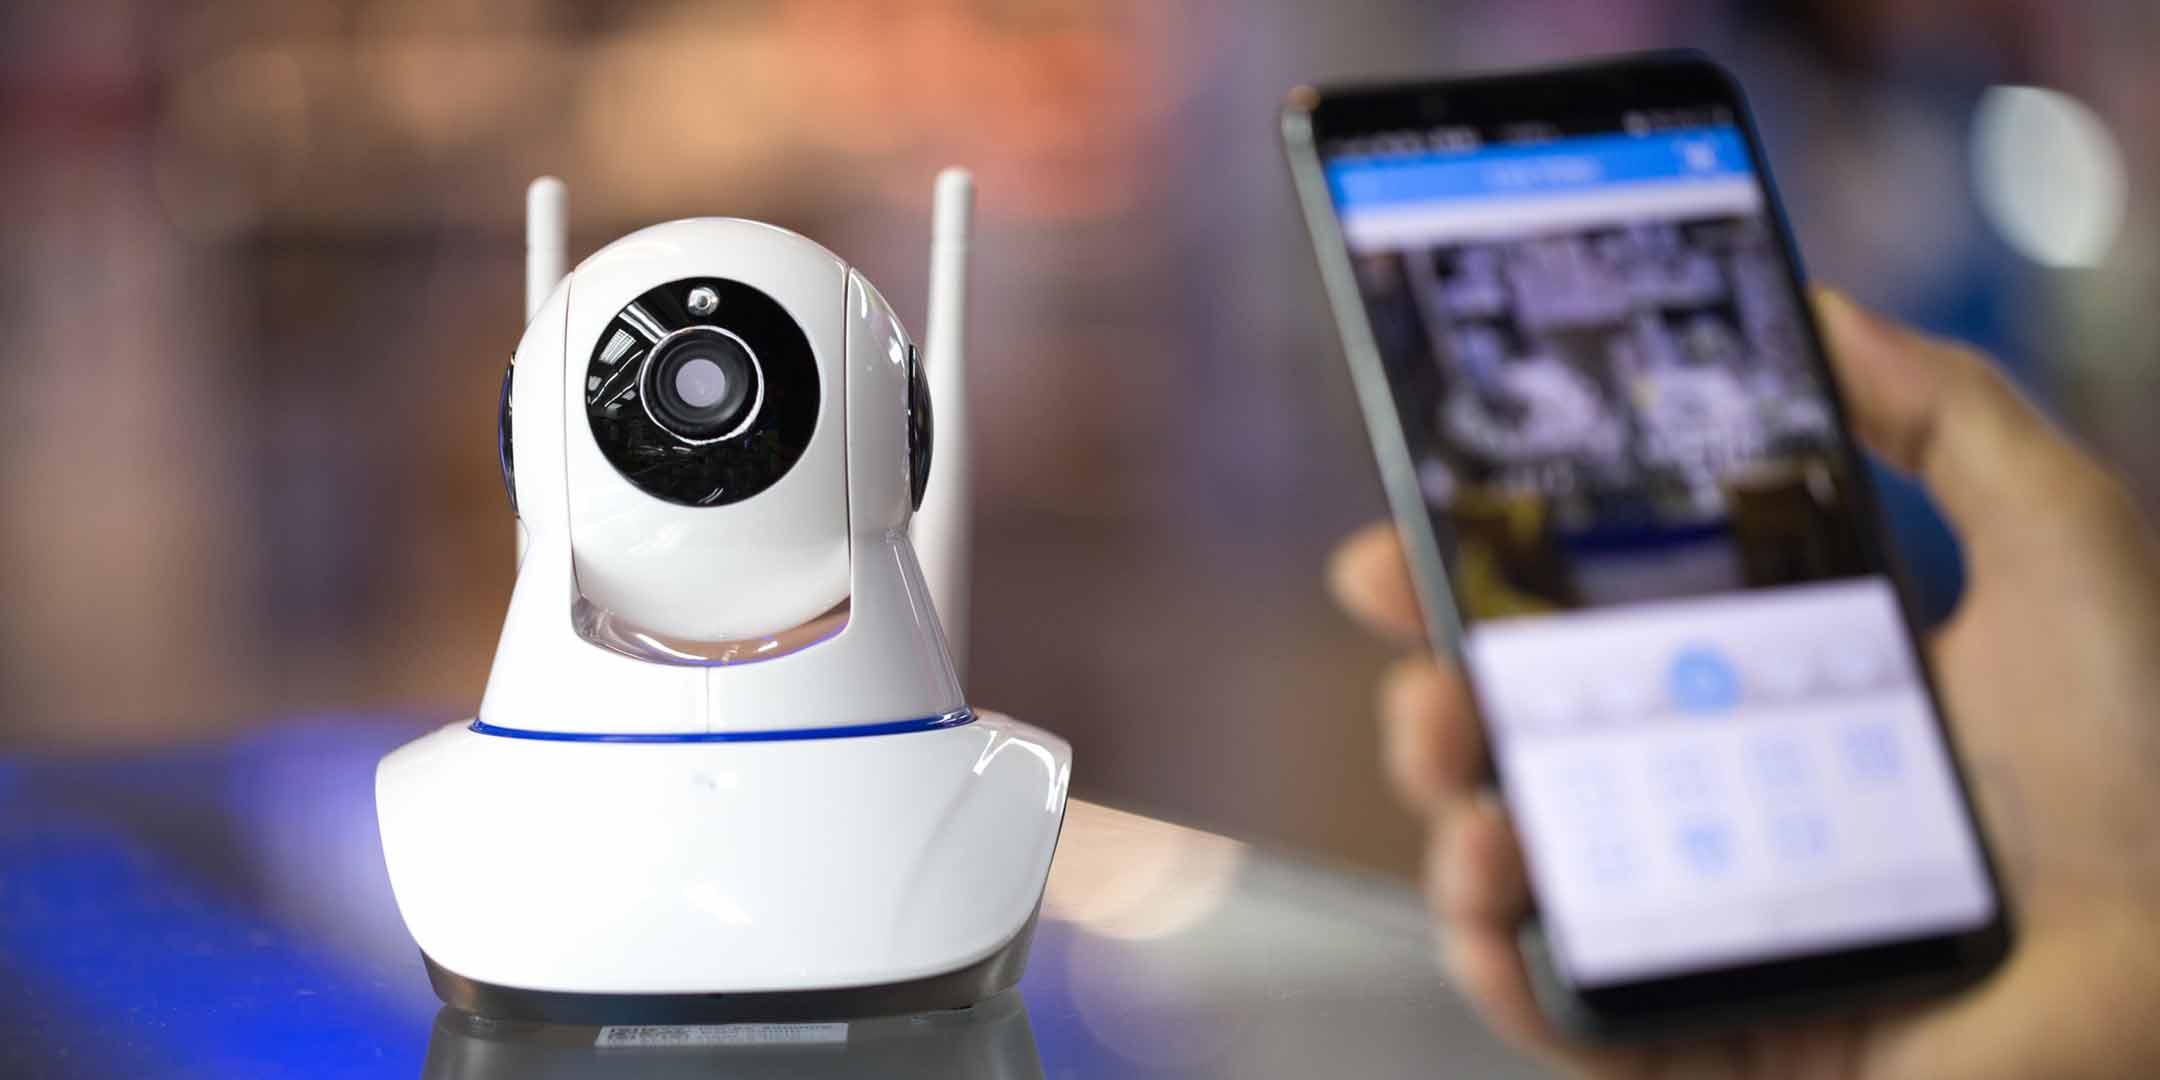 SecurityCamera-Image-Rectangle-2160x1080